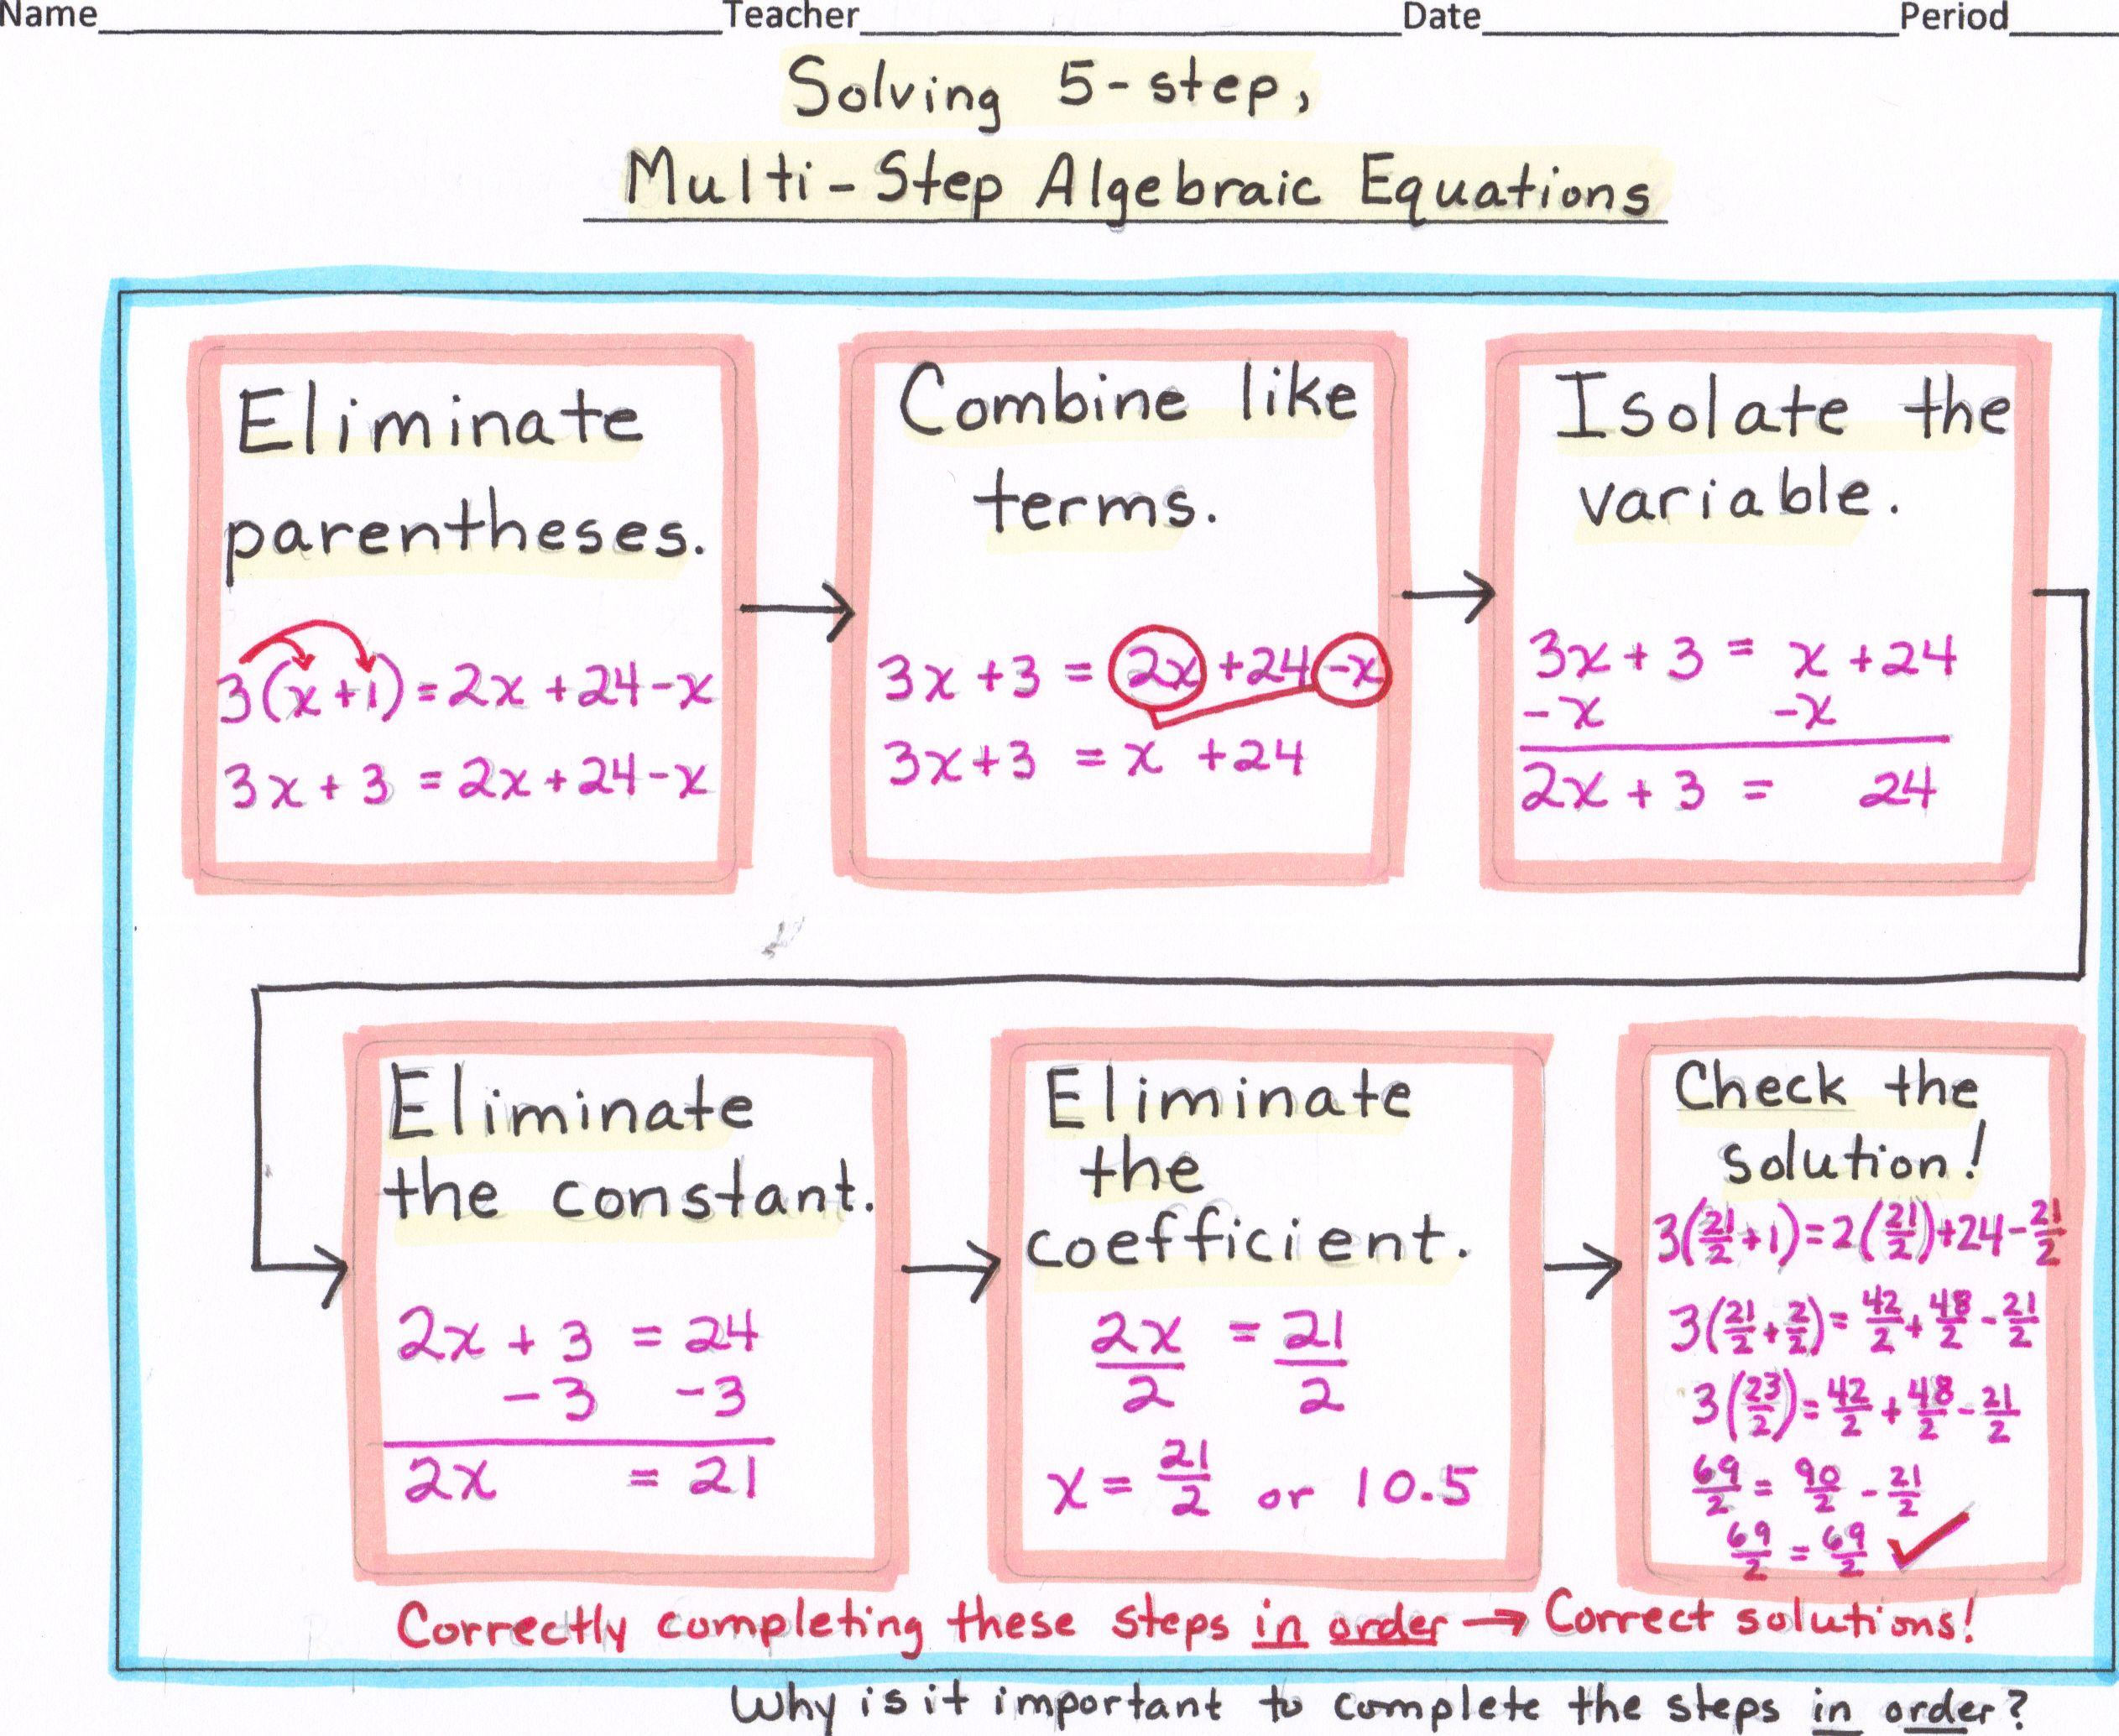 Math Algebra Flow Map Solving Multi Step Algebraic Equations